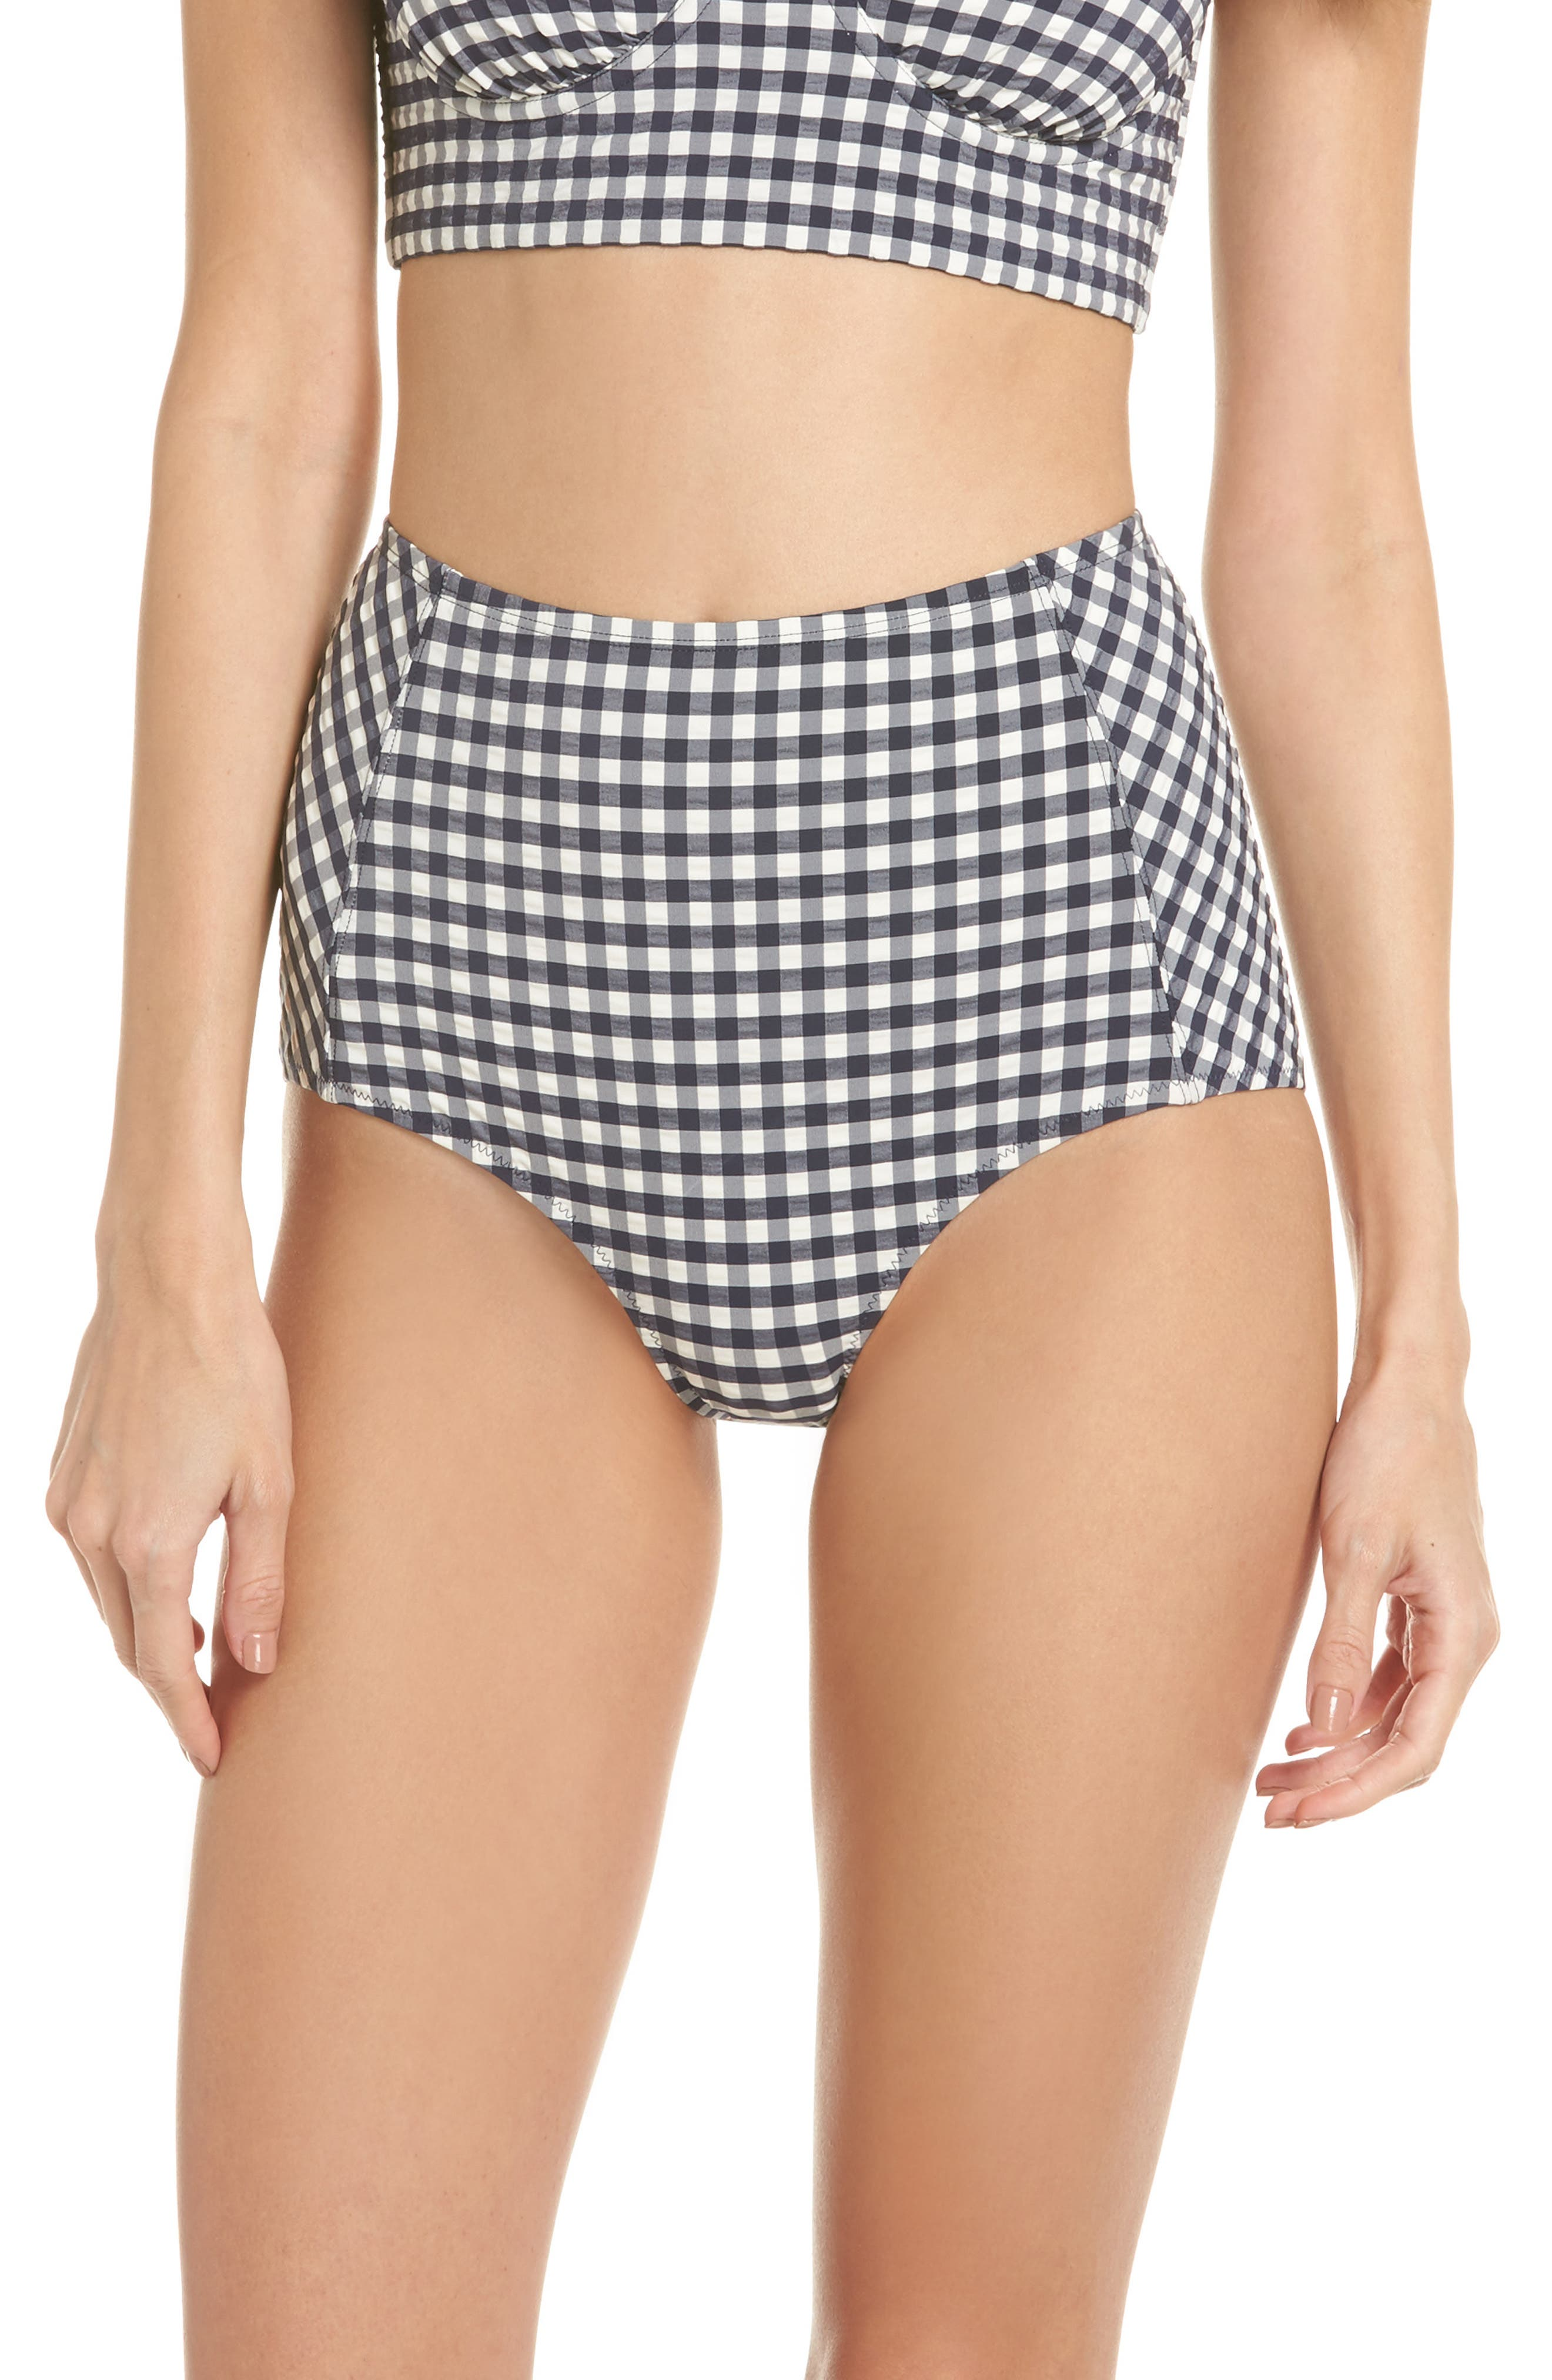 Gingham High Waist Bikini Bottoms,                         Main,                         color, Tory Navy / White